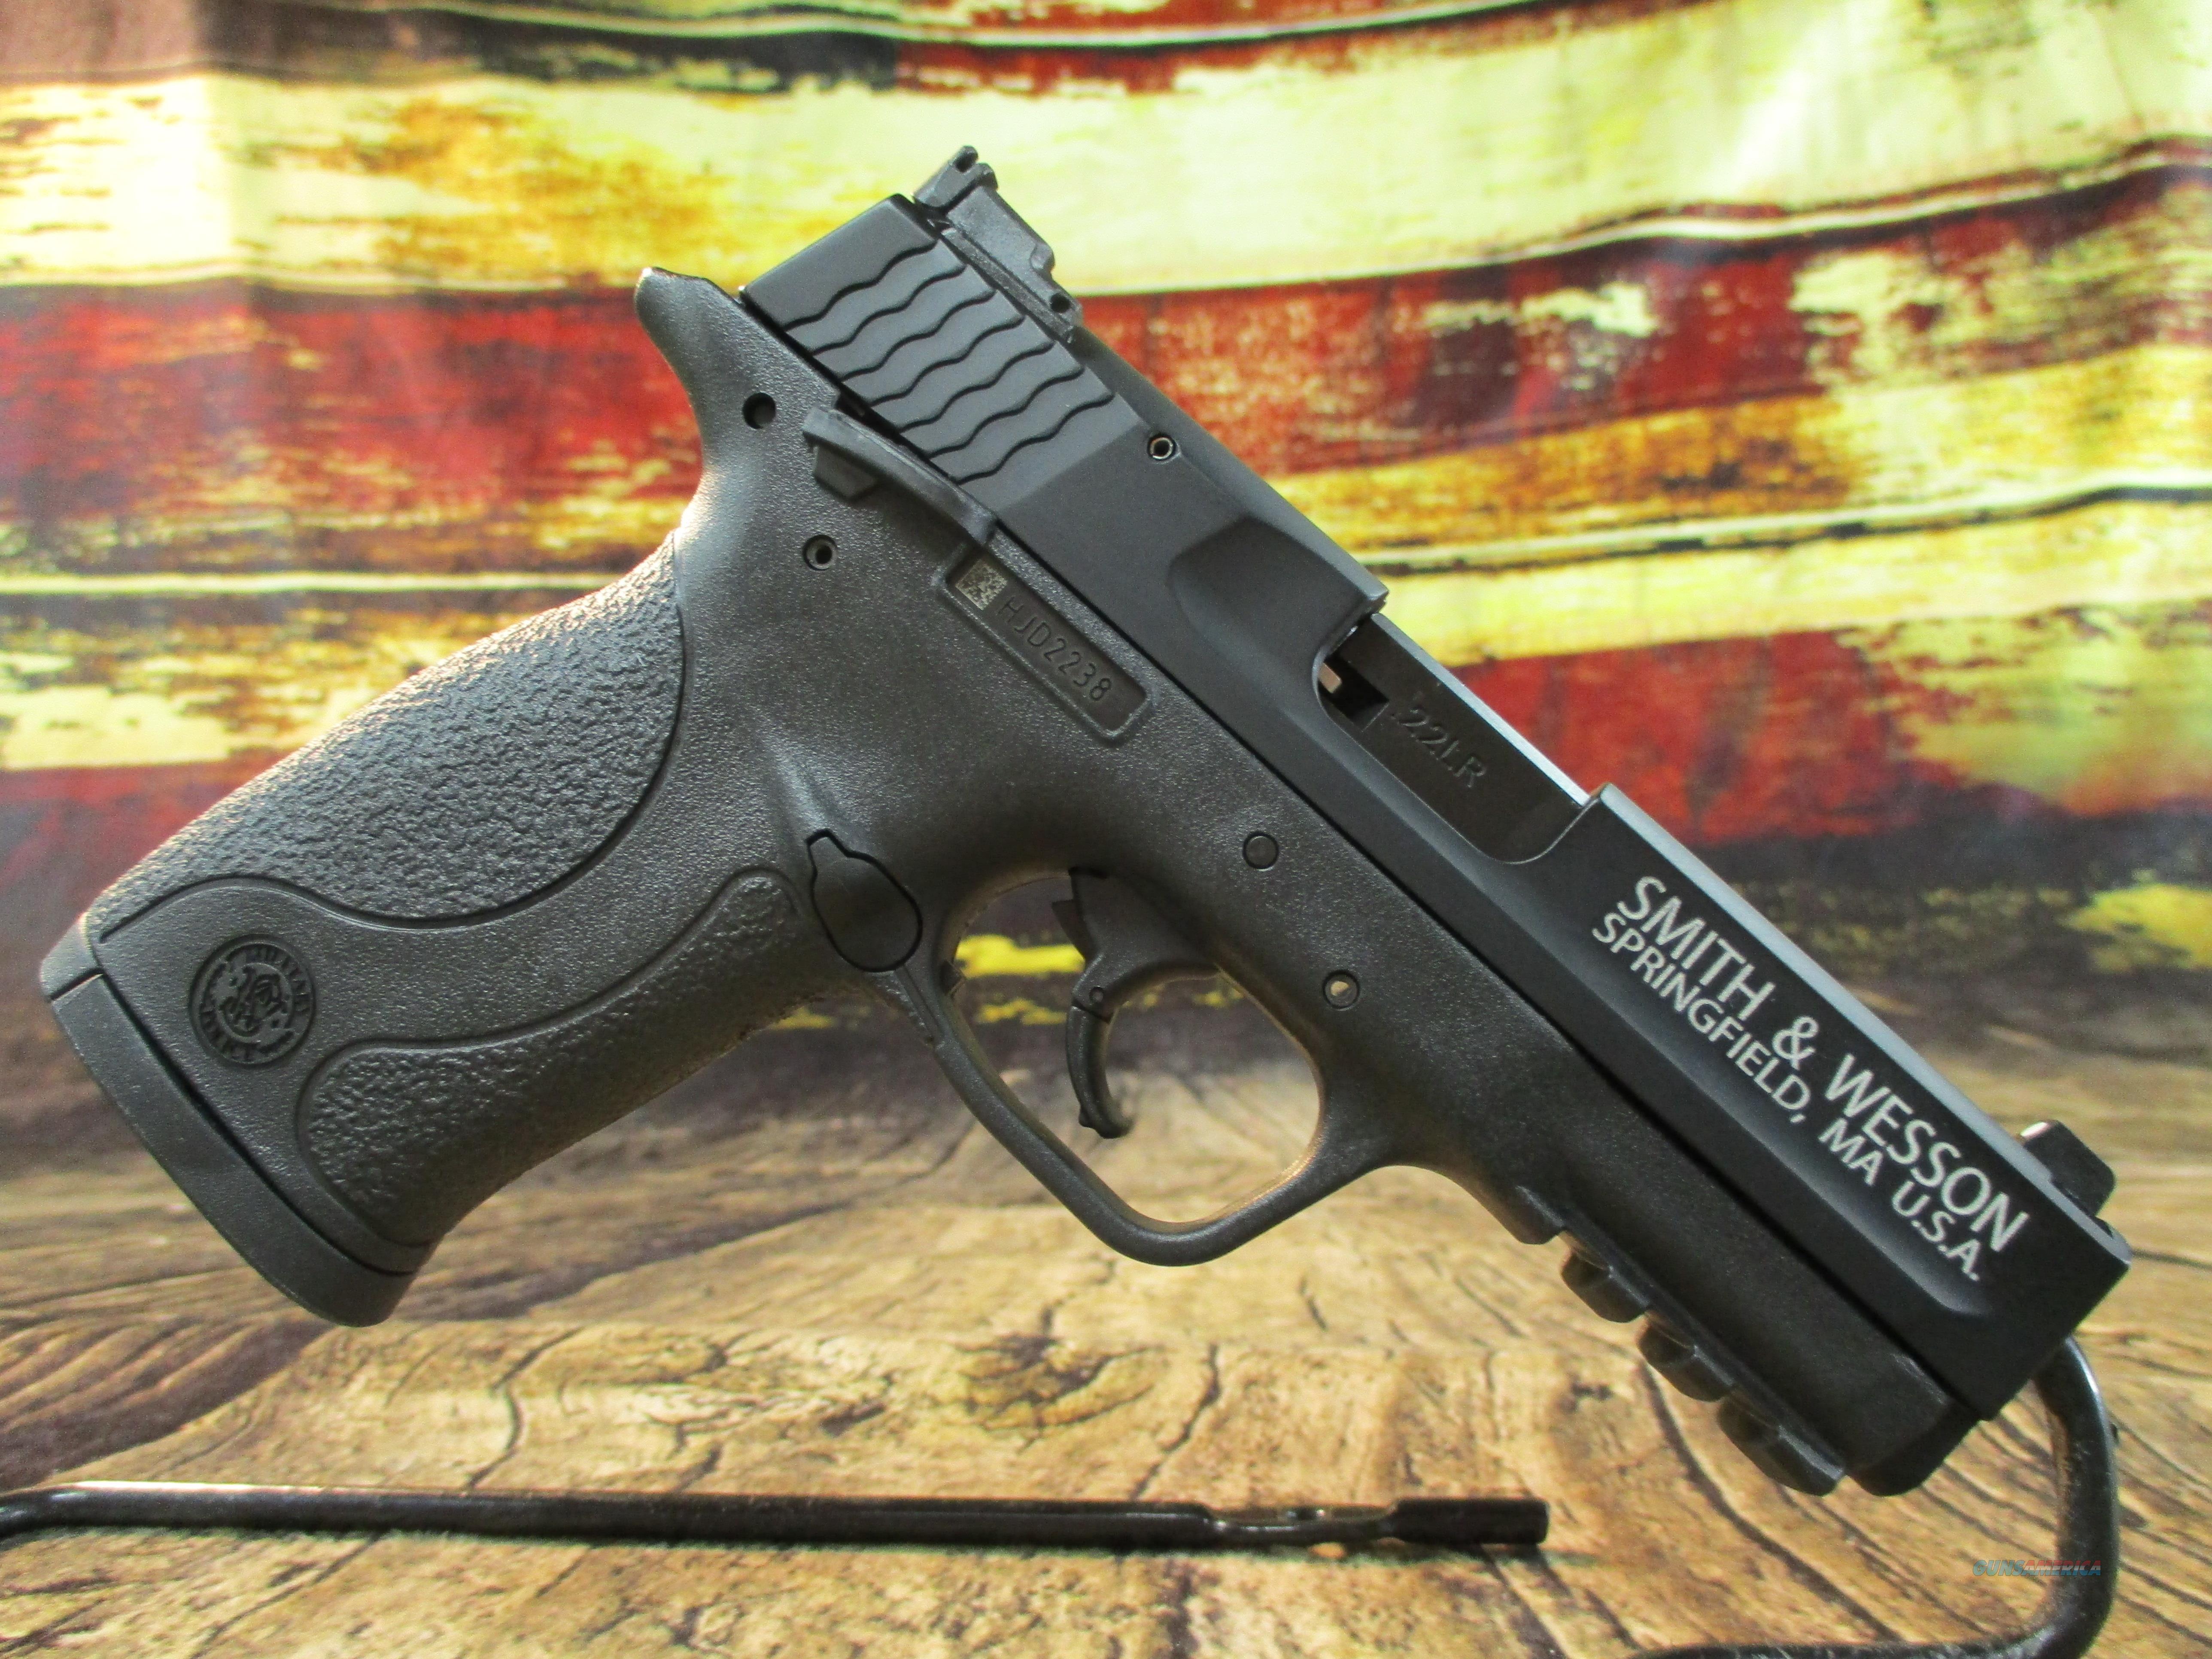 "Smith & Wesson 22 LR M&P 22 Compact 3.6"" New (108390)  Guns > Pistols > Smith & Wesson Pistols - Autos > .22 Autos"